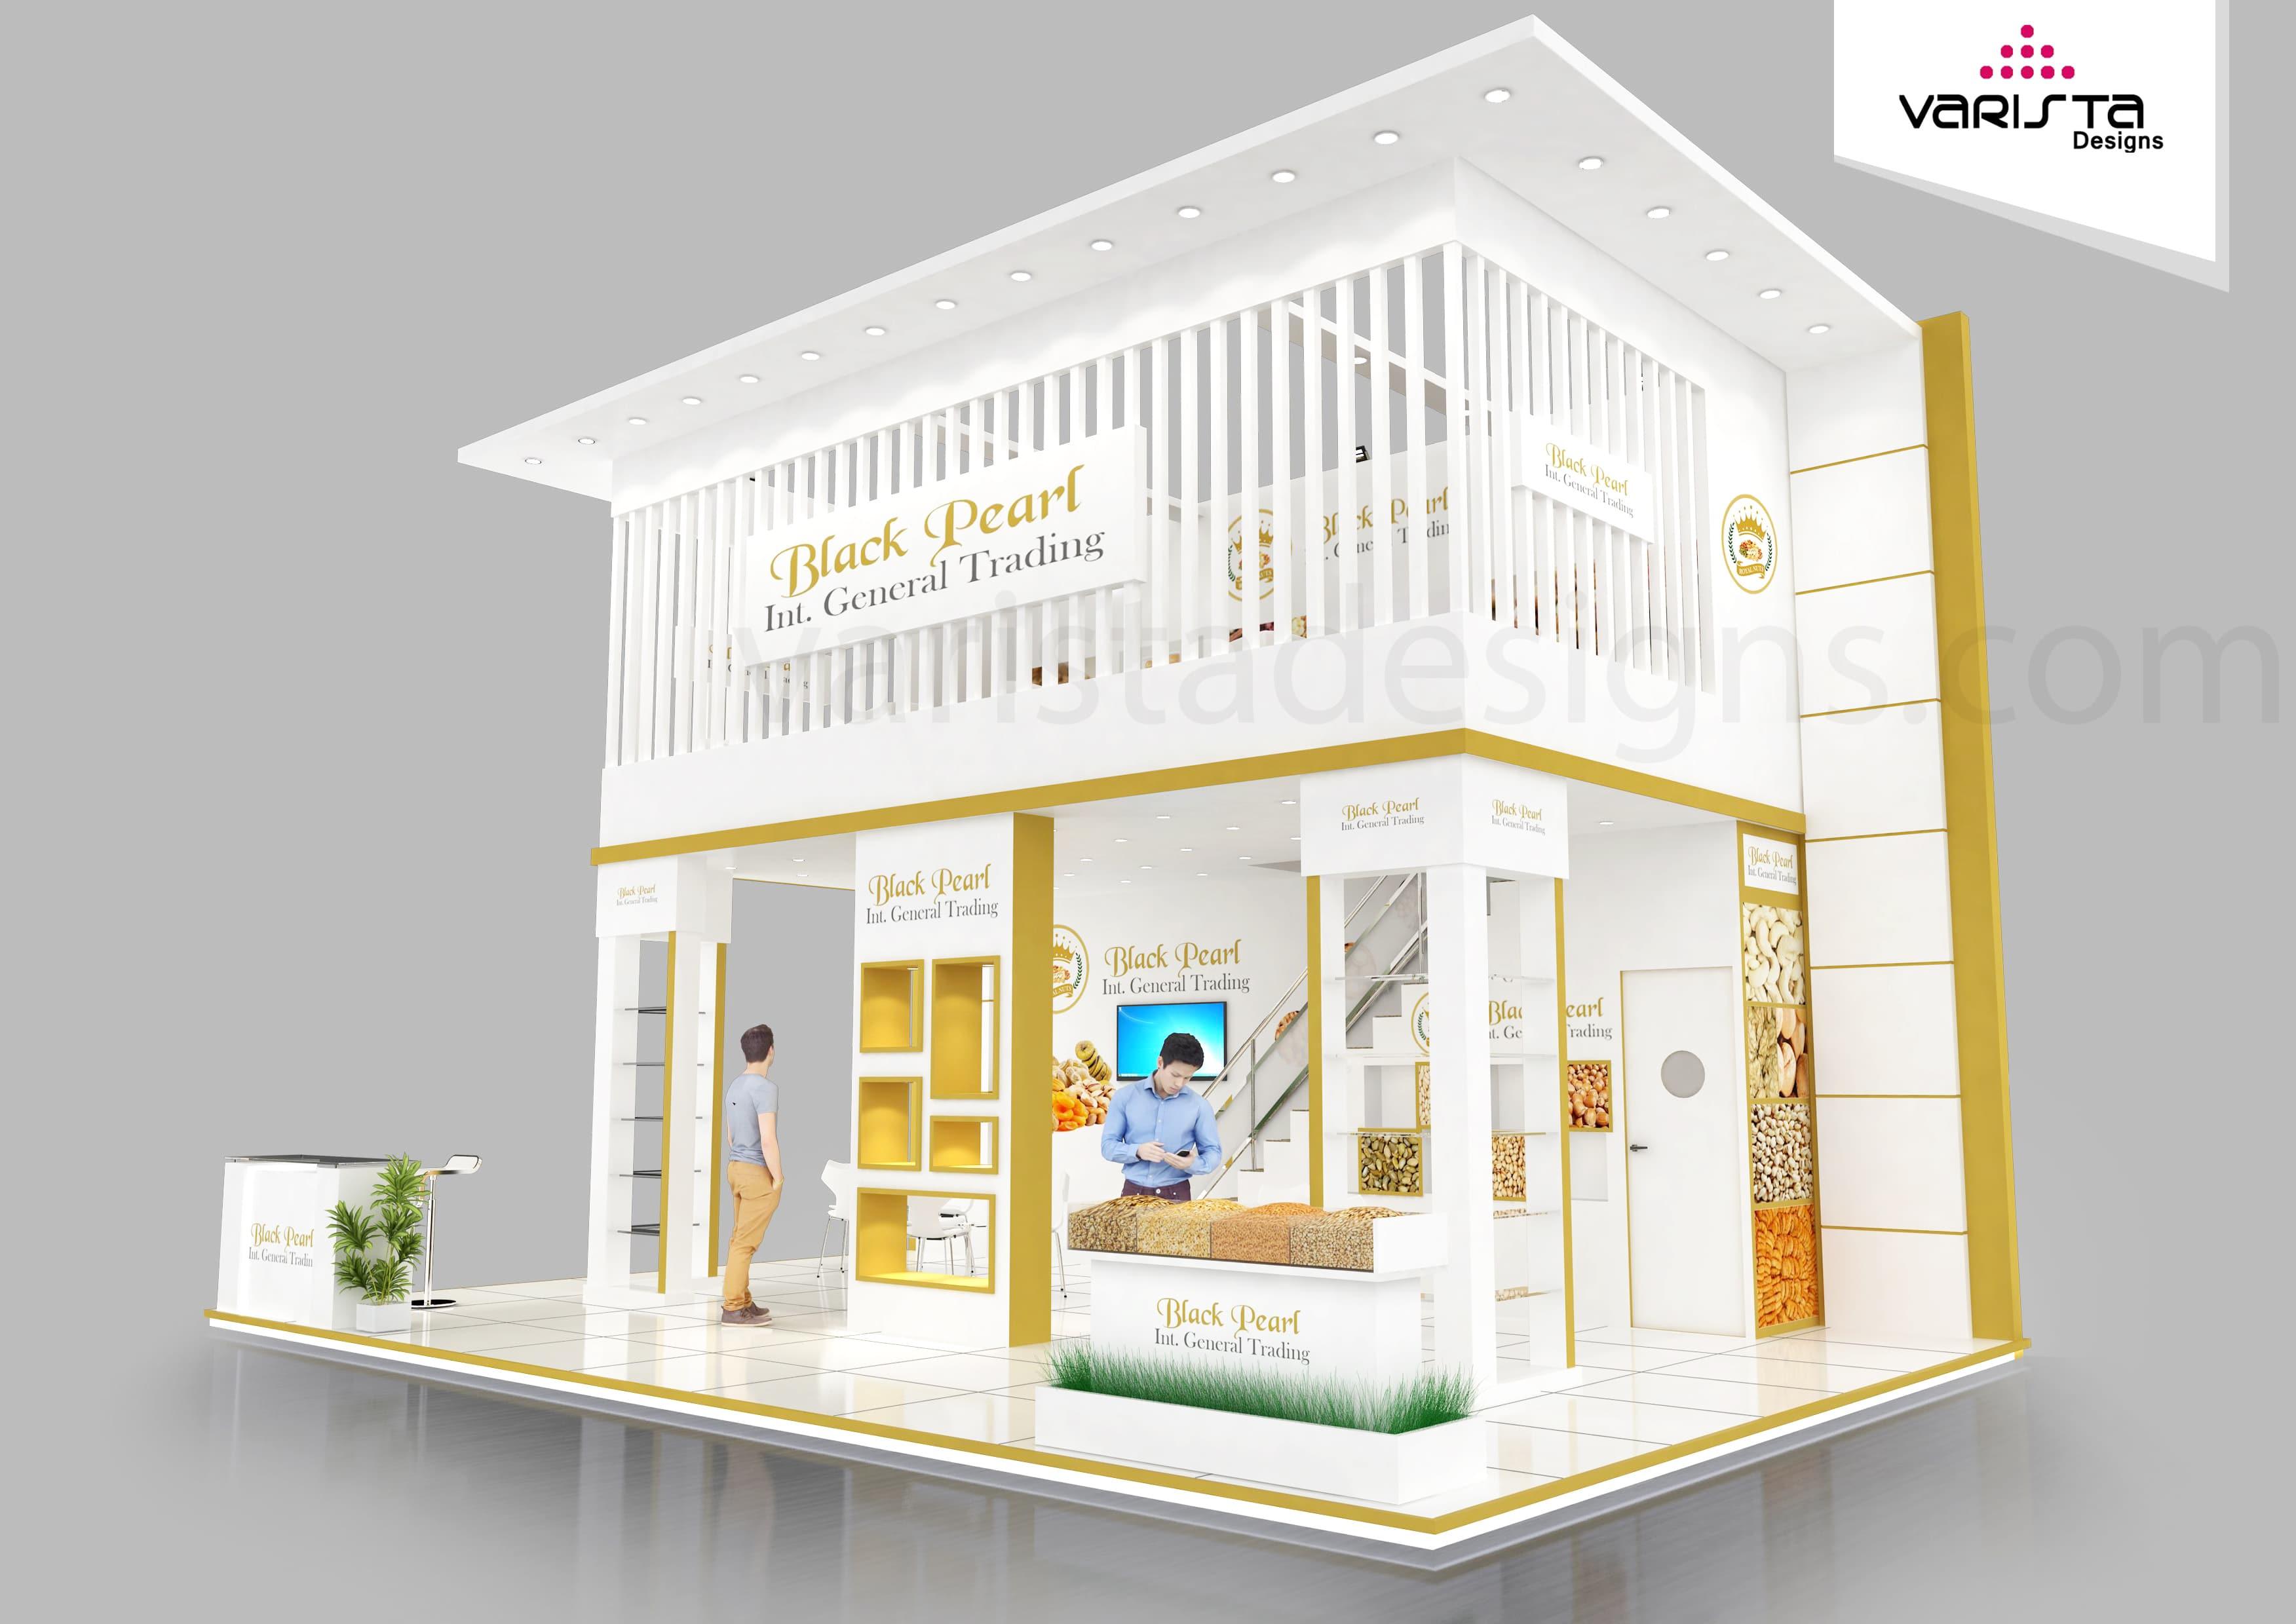 Black Pearl International General Trading Exhibition stand Dubai